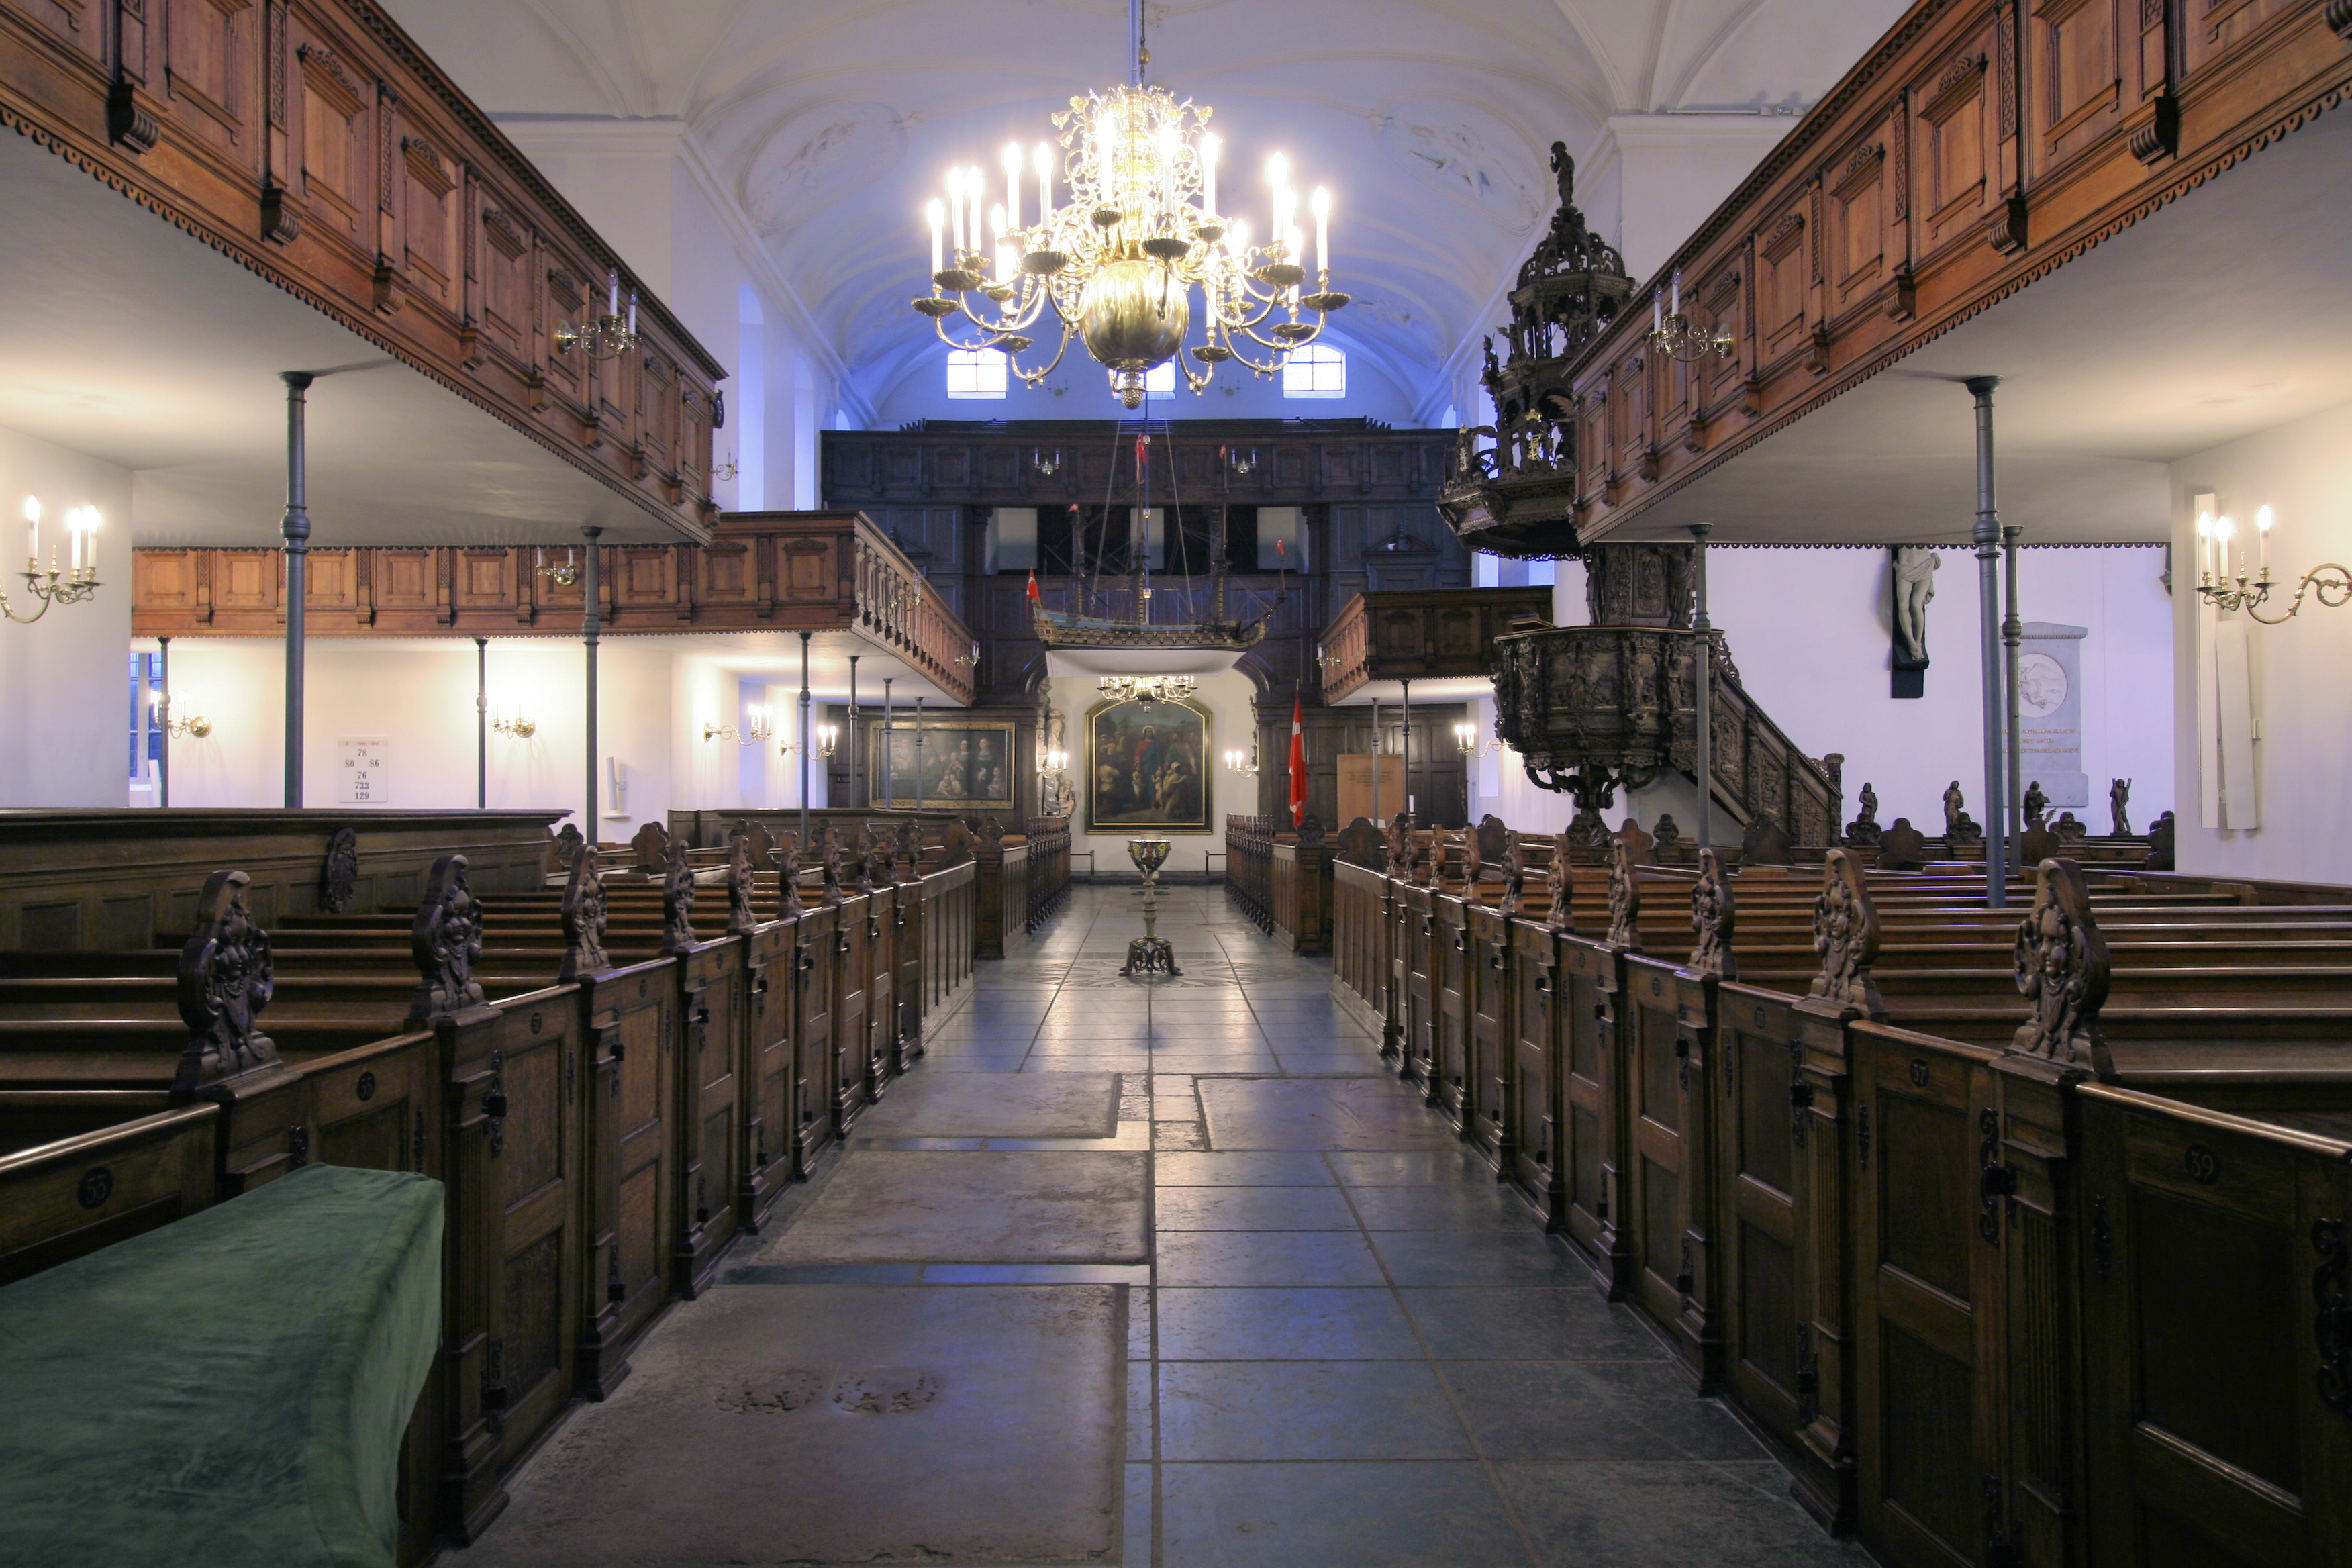 holmens kirke wiki